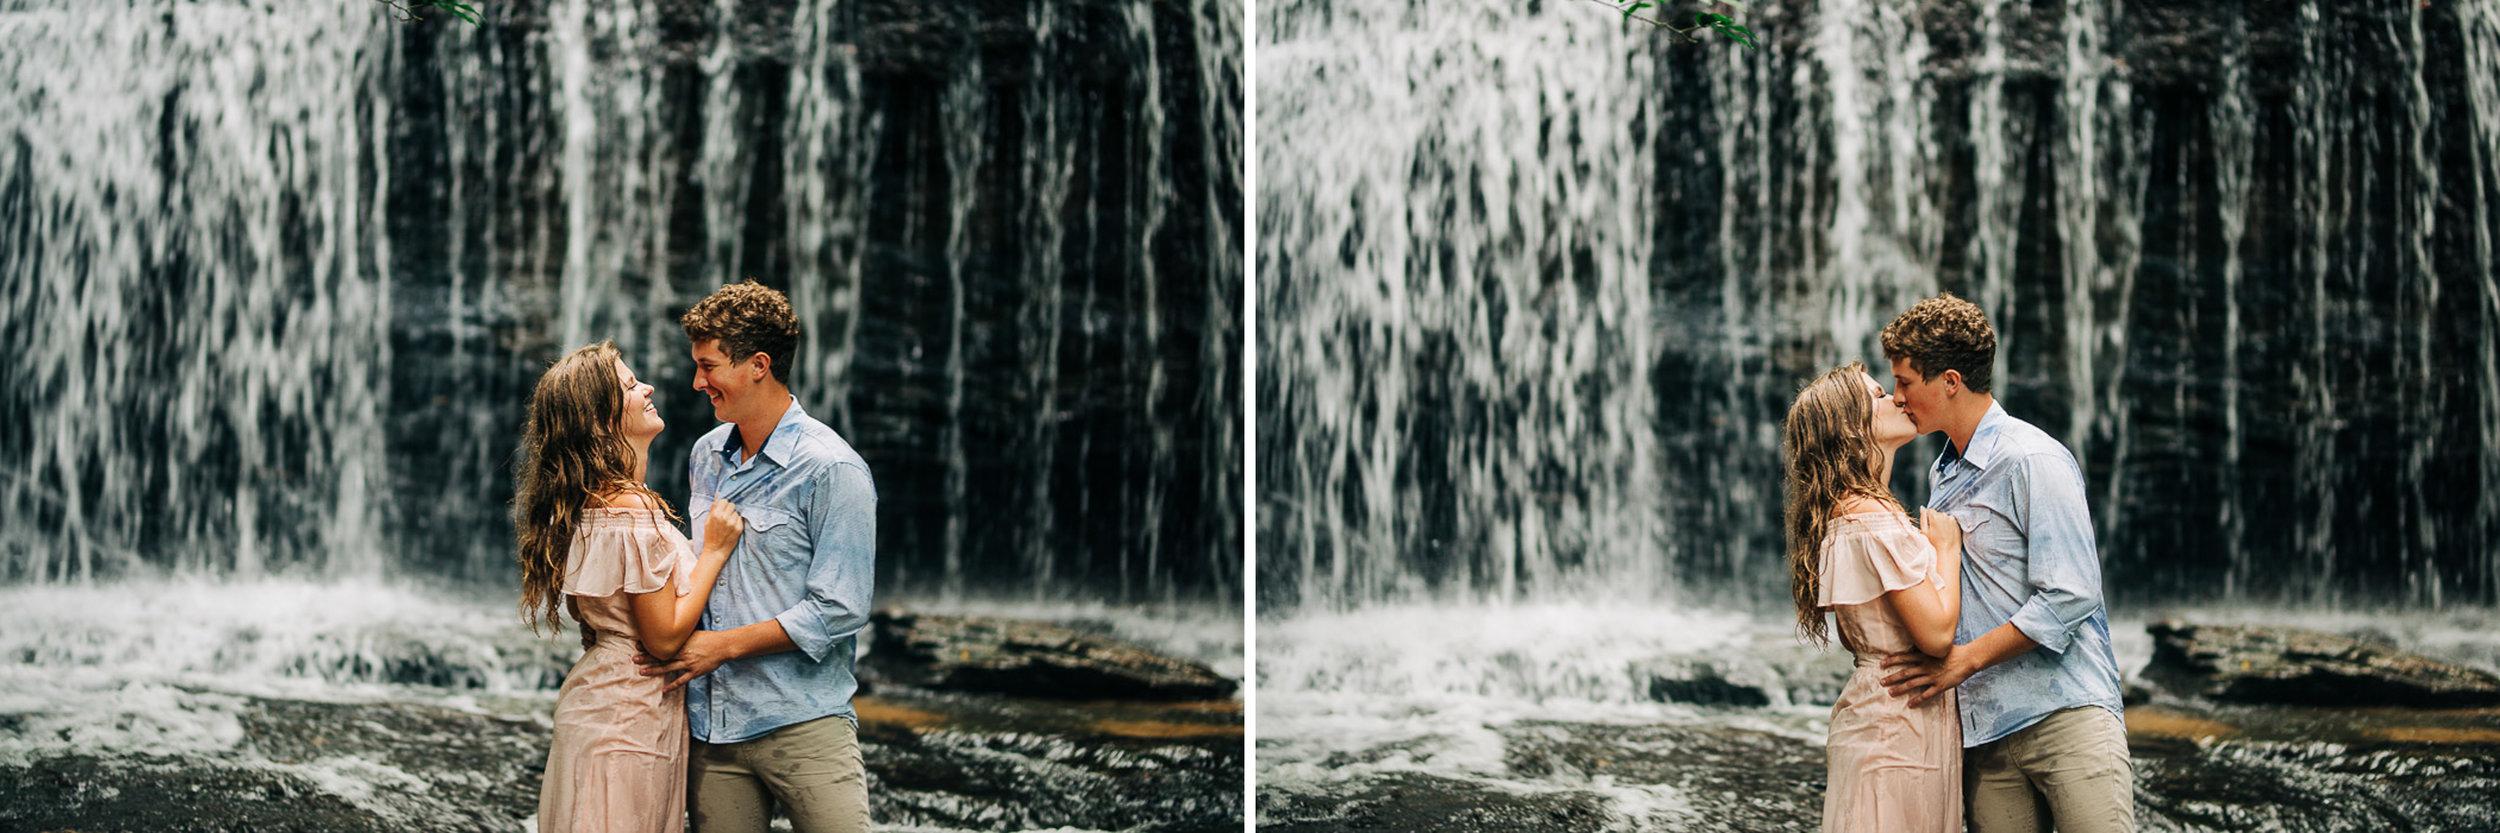 Engagement Portraits, Summer Engagement, Summer Mast Photography, 26.jpg